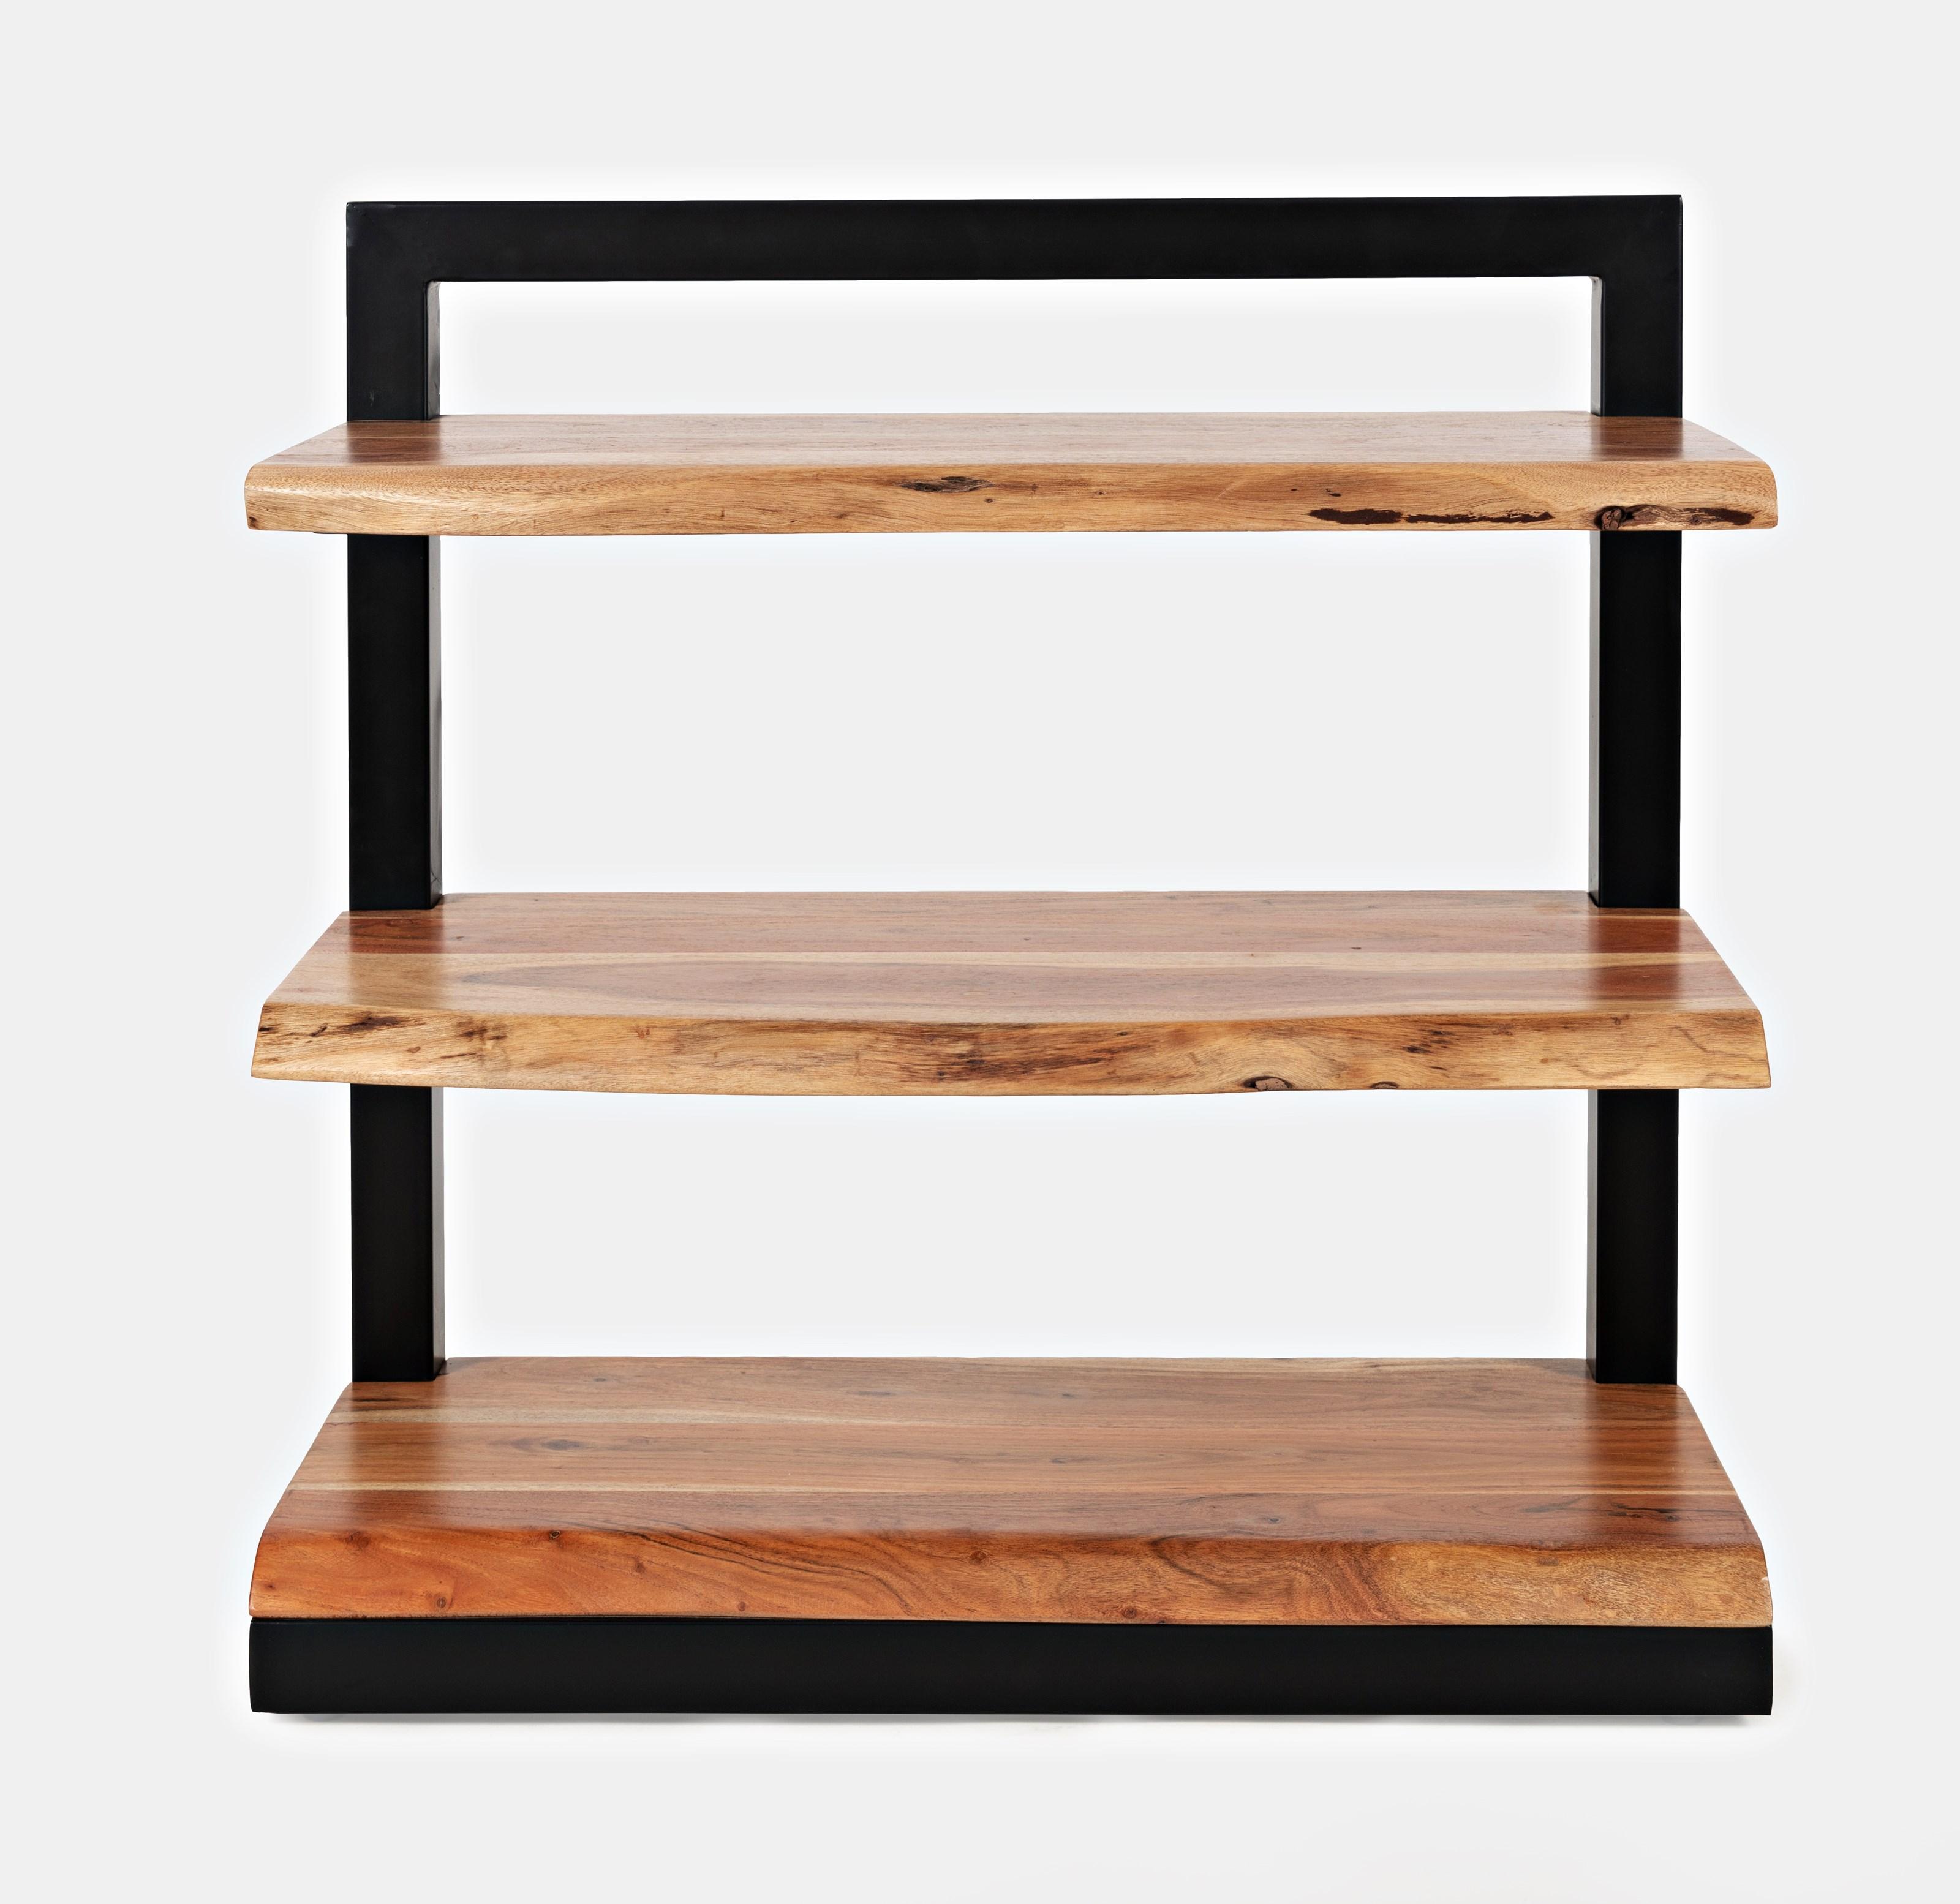 Nature's Edge 3 Shelf Bookcase by Jofran at Jofran